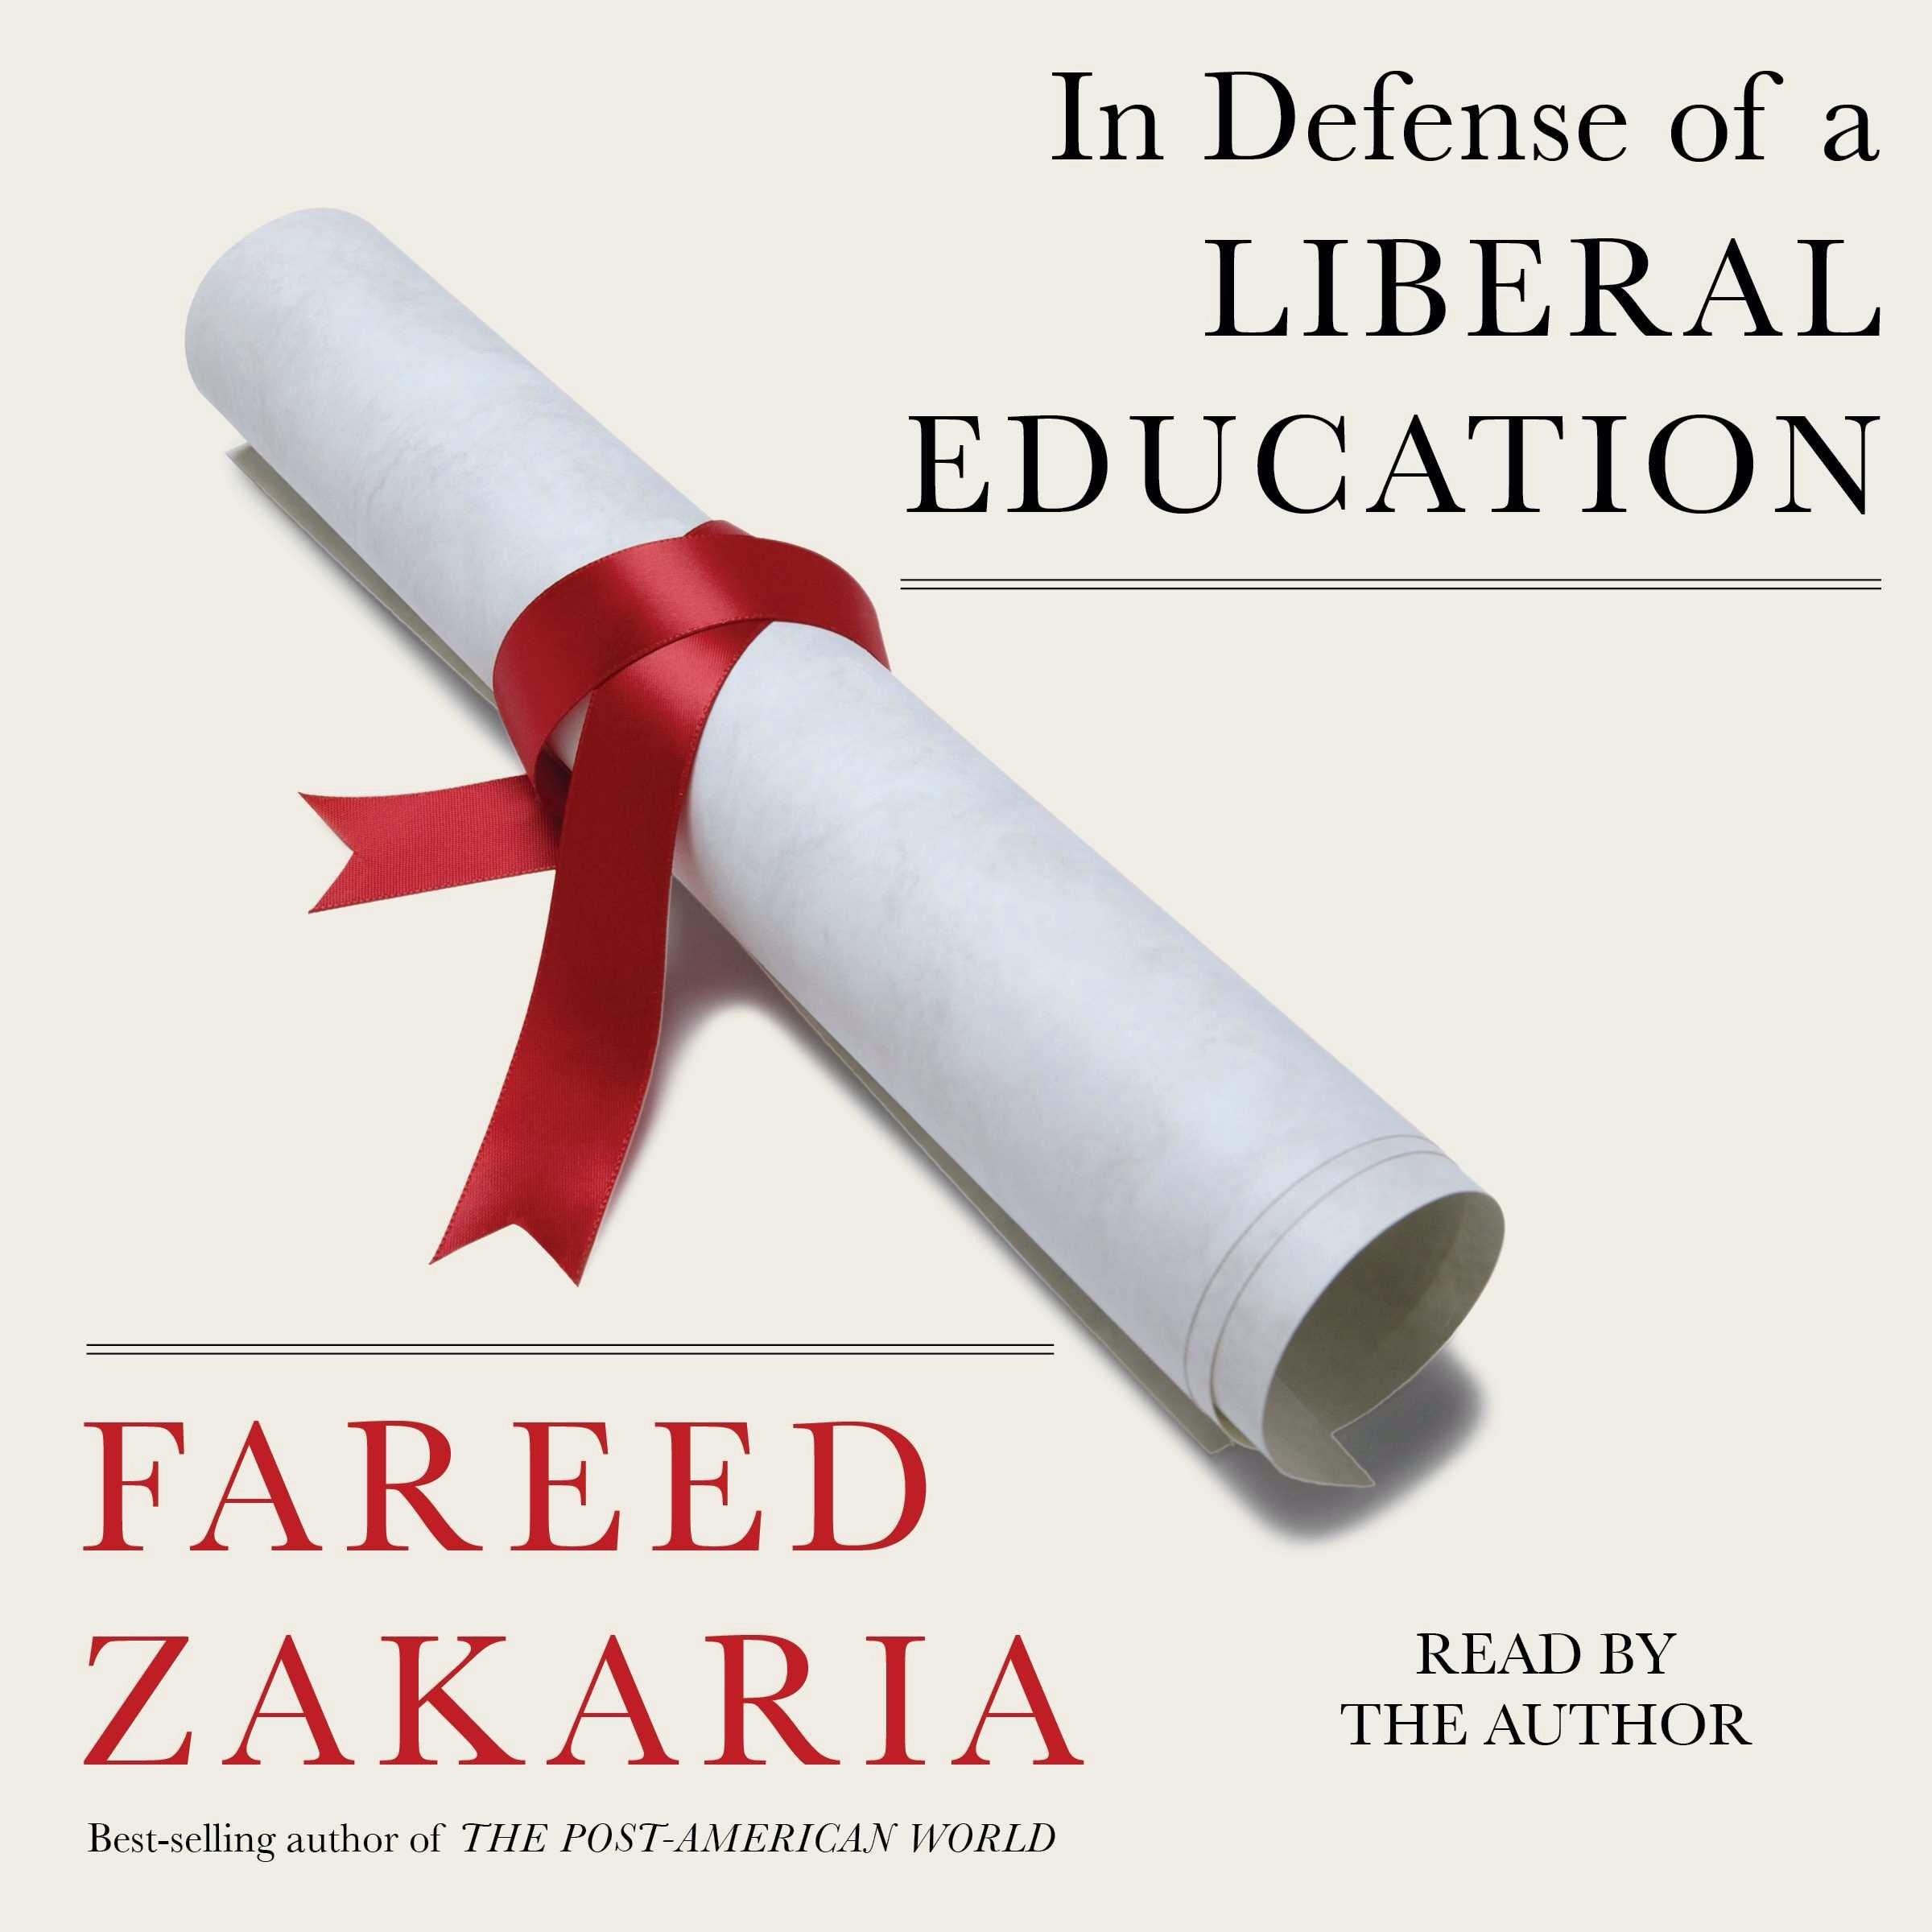 Liberal education